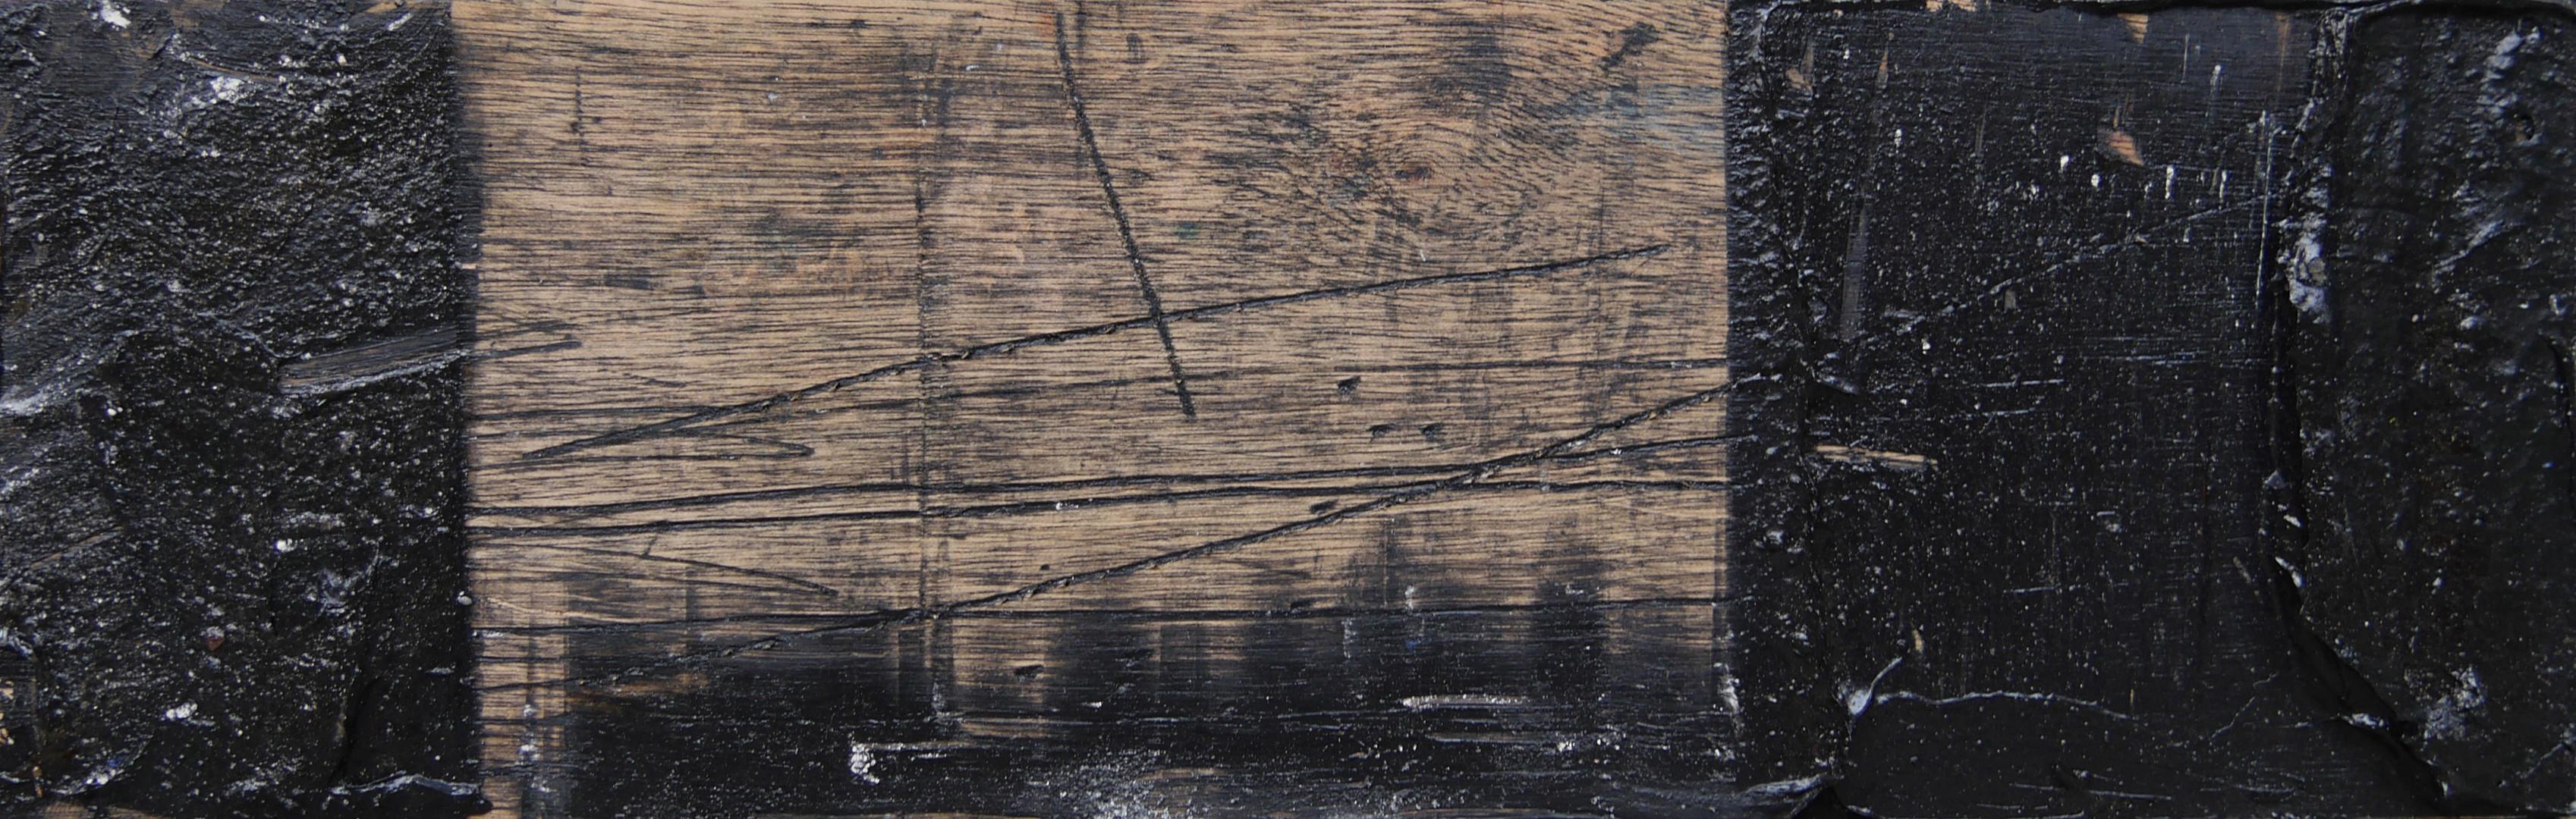 风景 VI (paysages) 10x32 cm.jpg